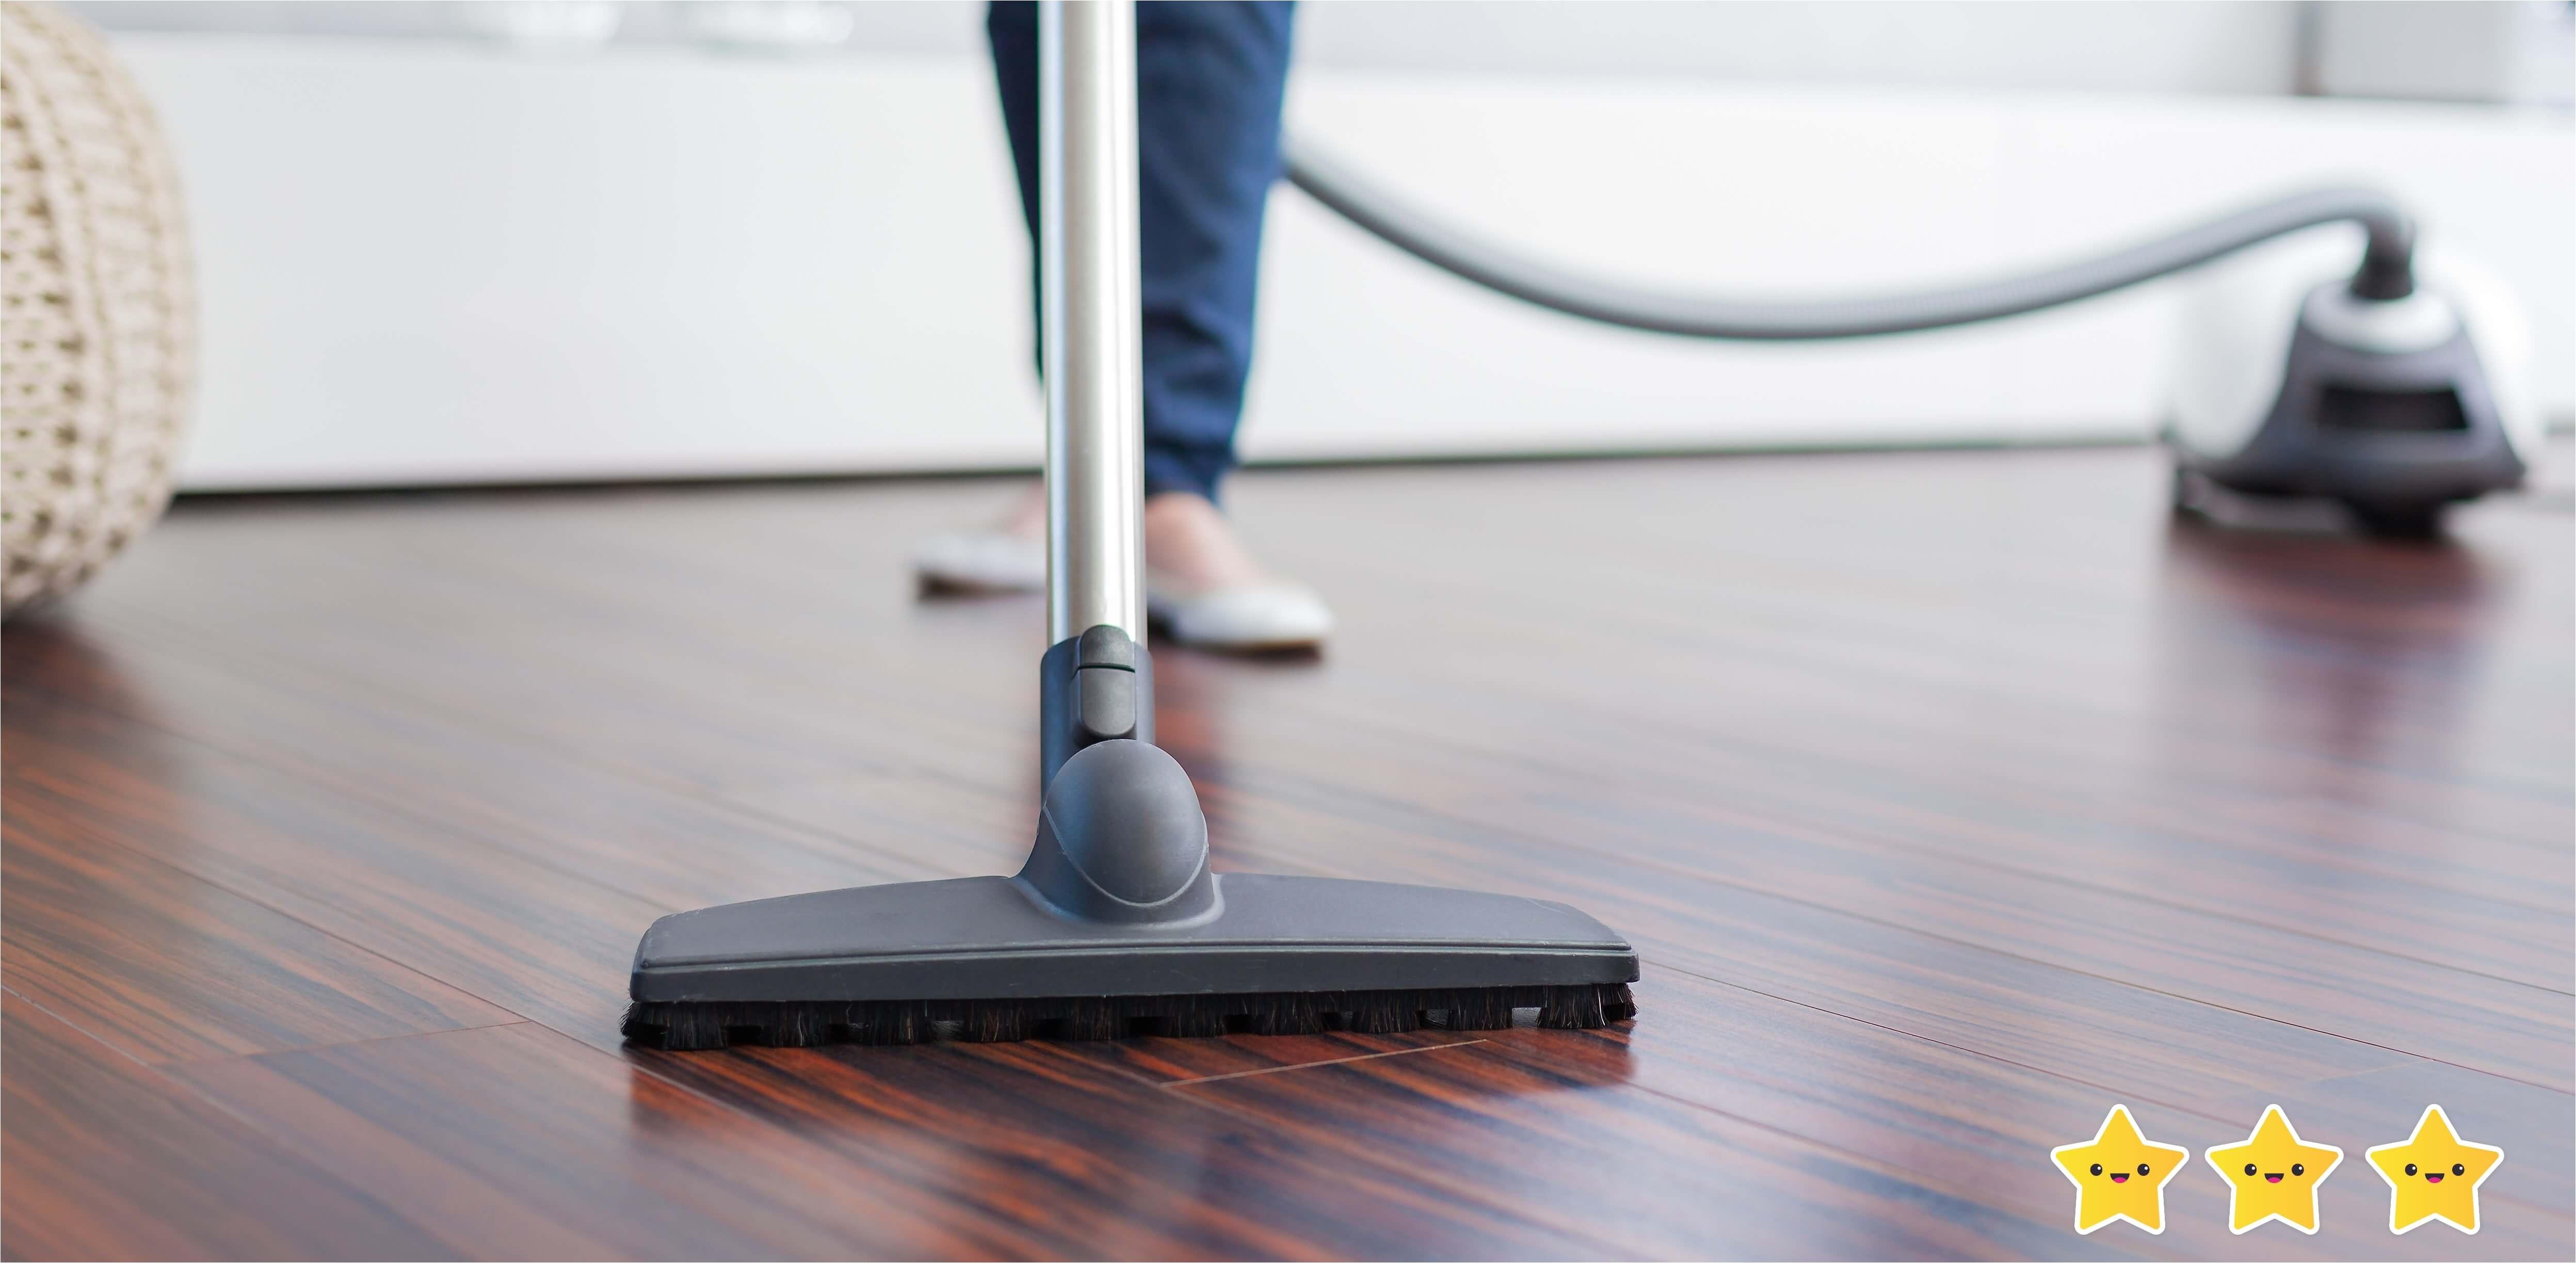 Bissell Poweredge Pet Hard Floor Corded Vacuum 81l2a top 5 Best Vacuum for Laminate Floors Reviews 2018 Large Reviews